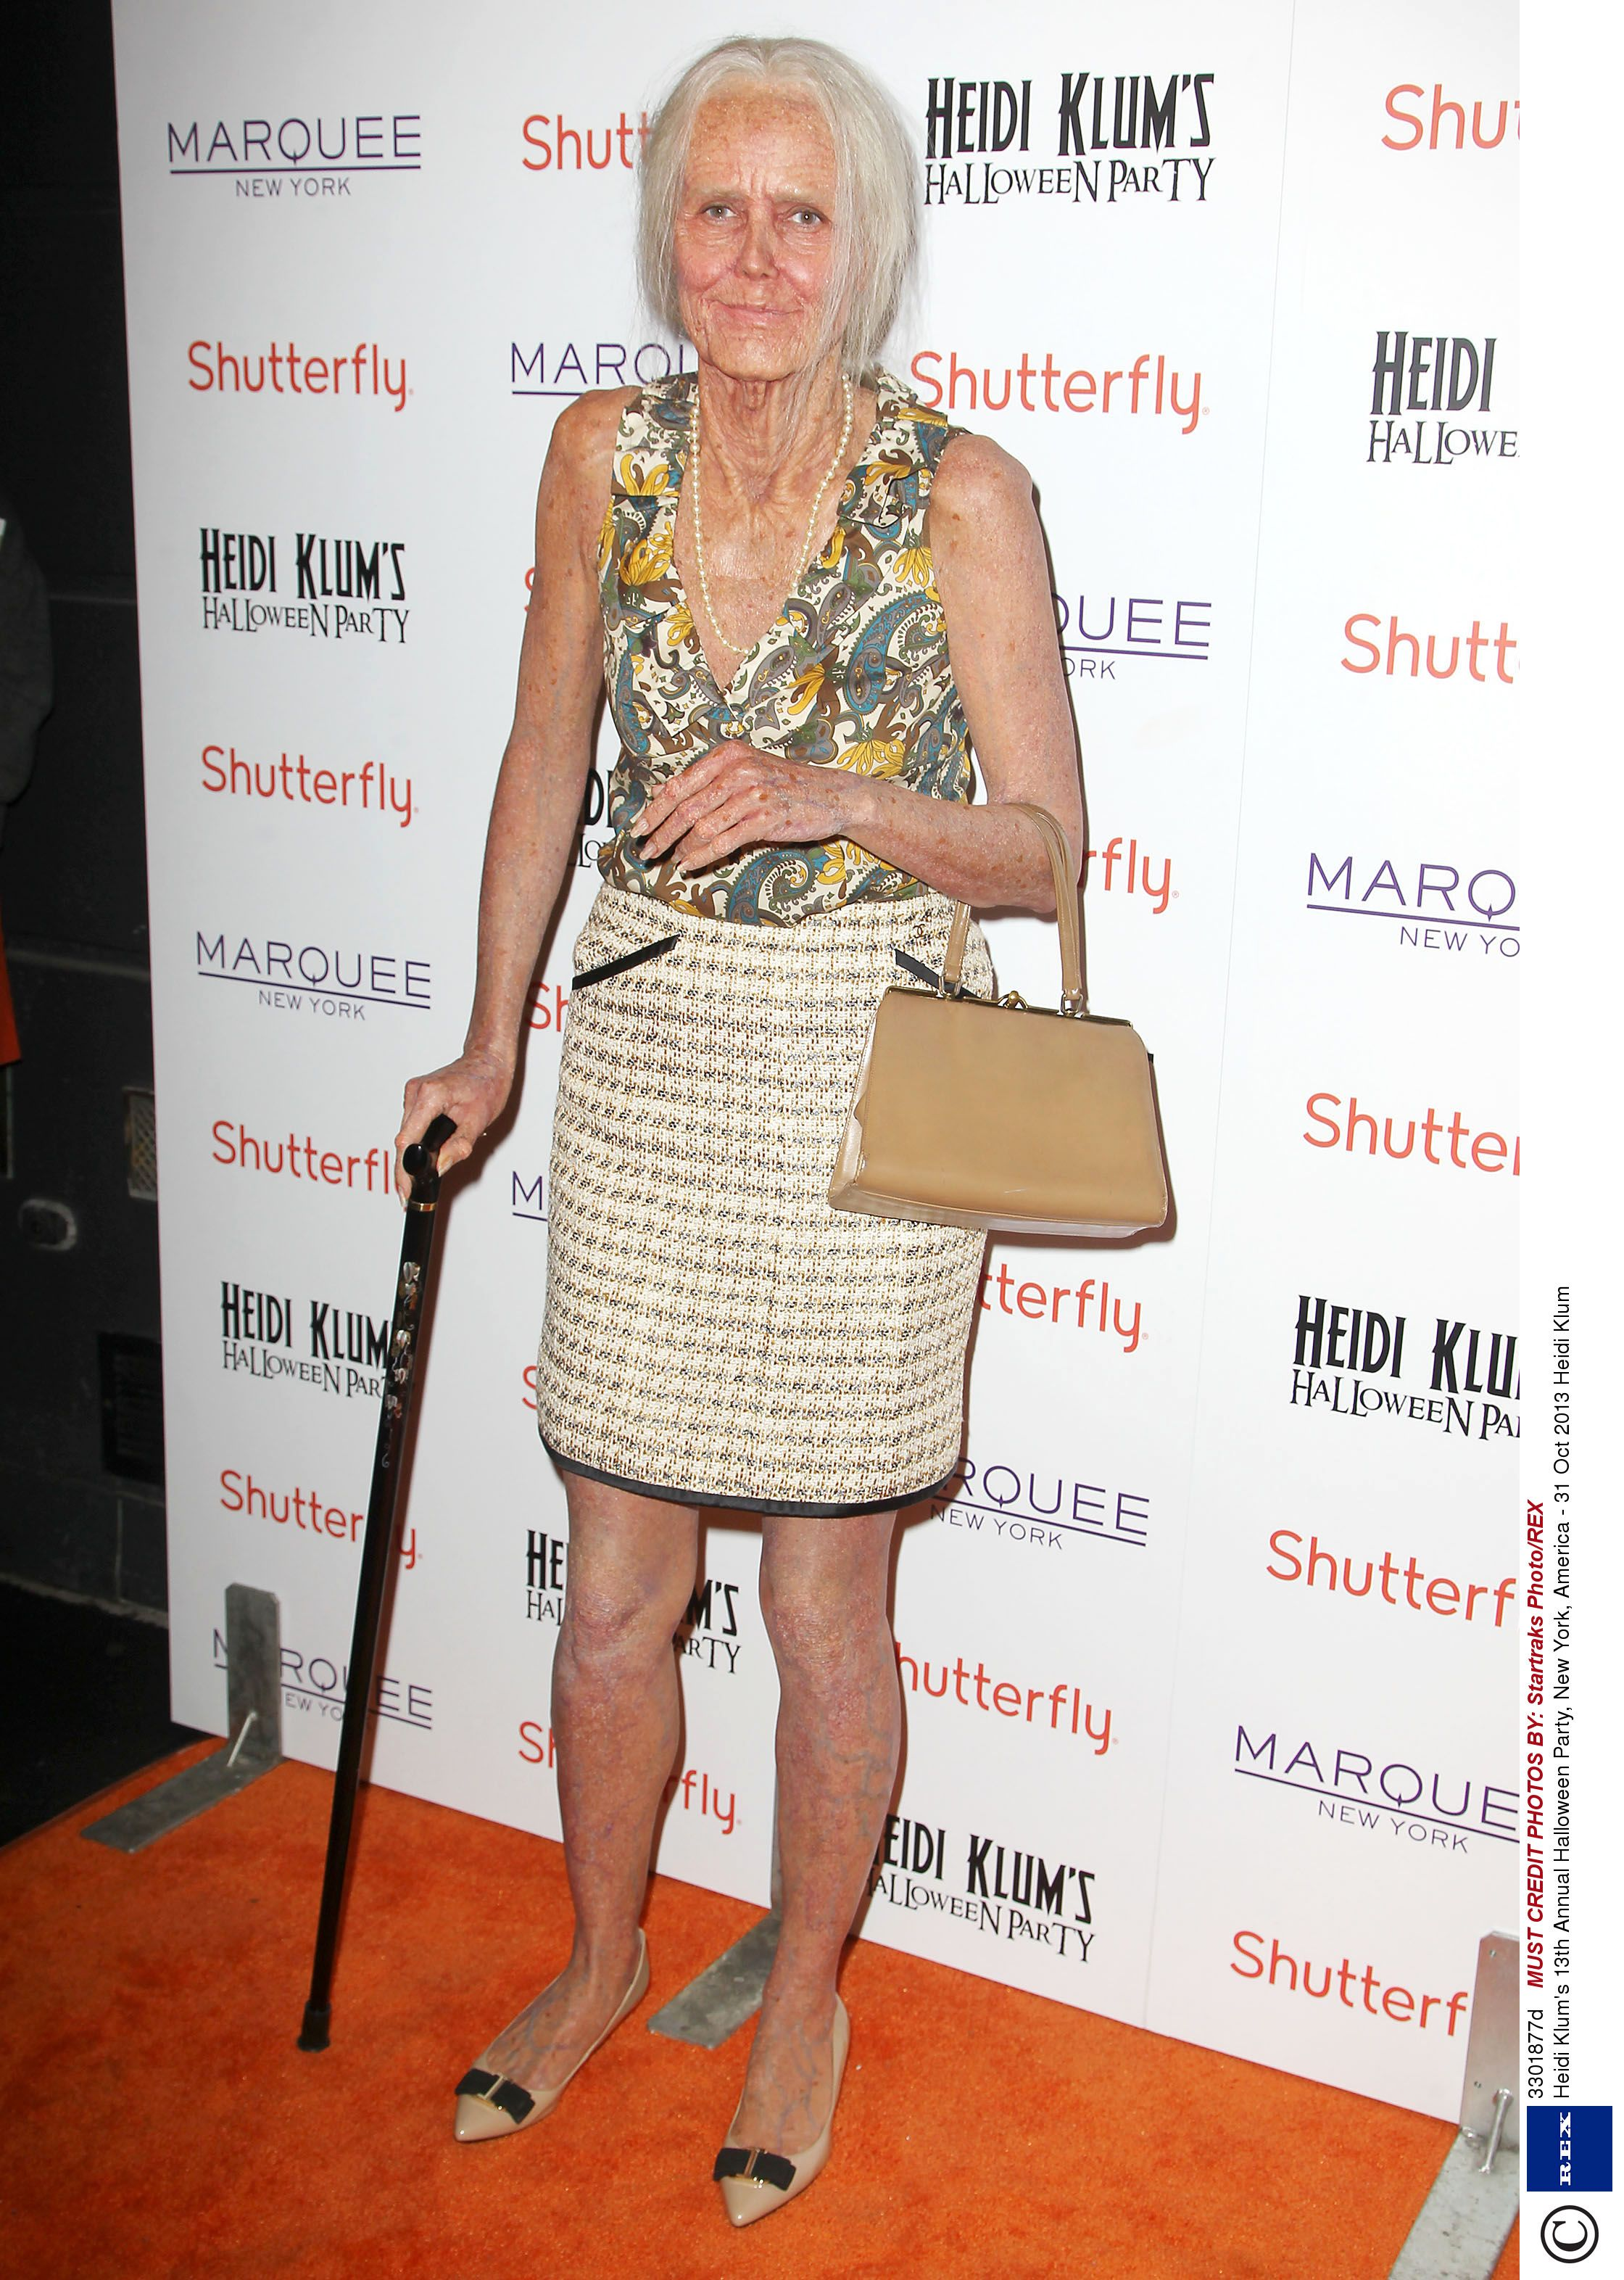 Heidi Klum Halloween Bash 2020.Heidi Klum As Old Woman For Halloween